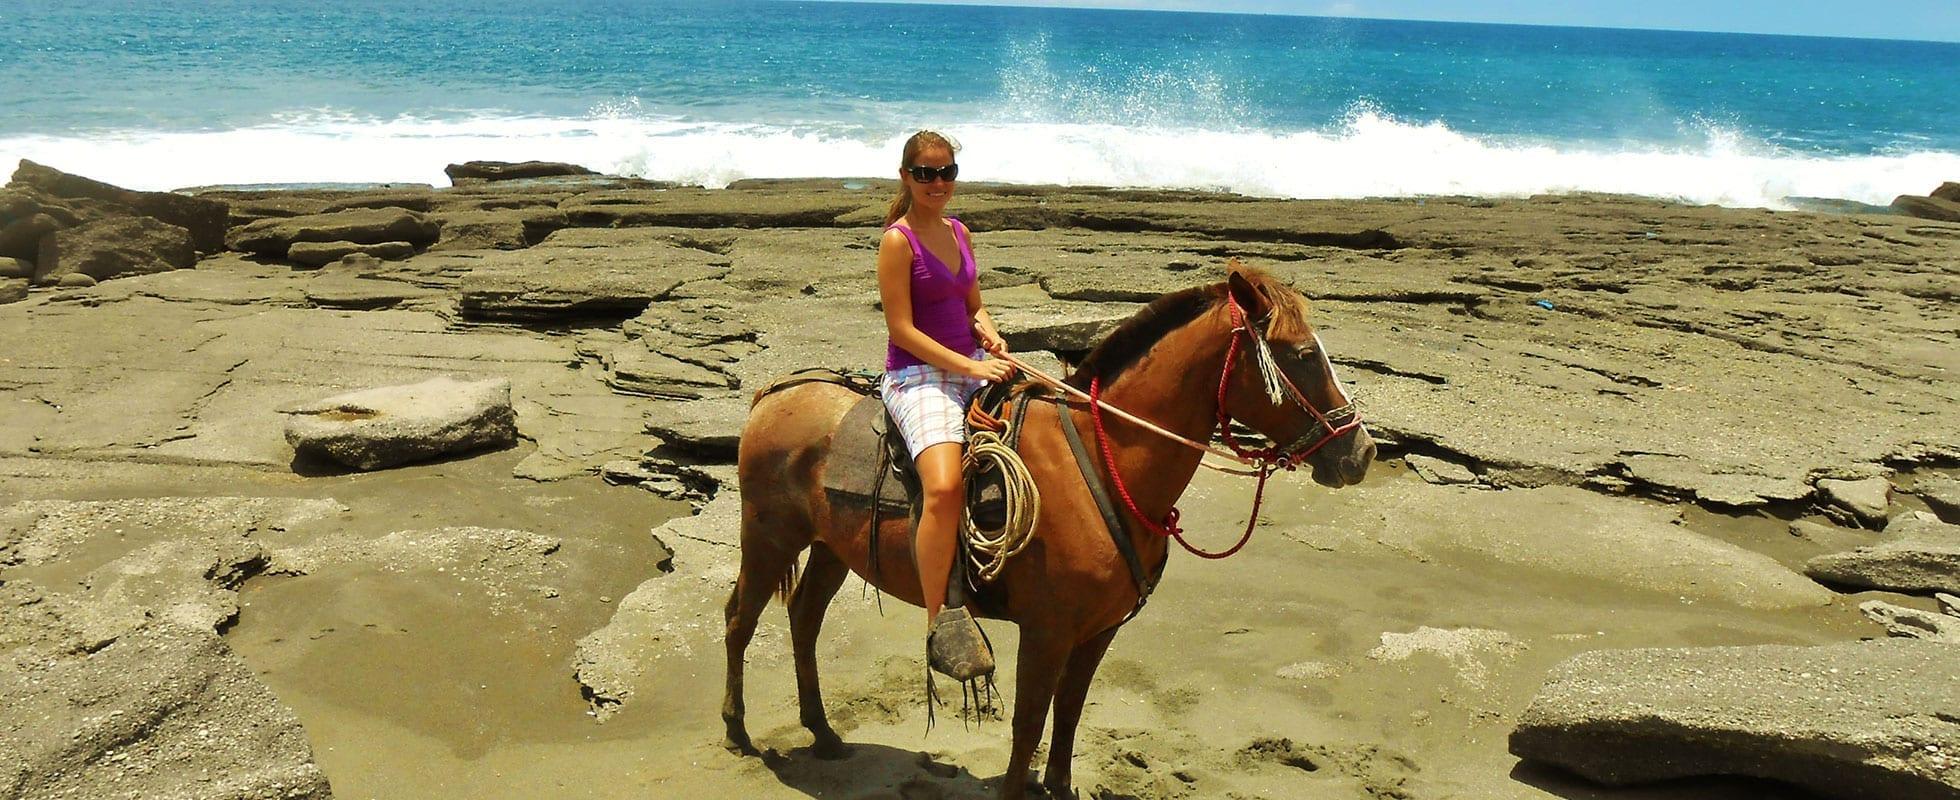 Horseback-Riding-1-rancho-tropical